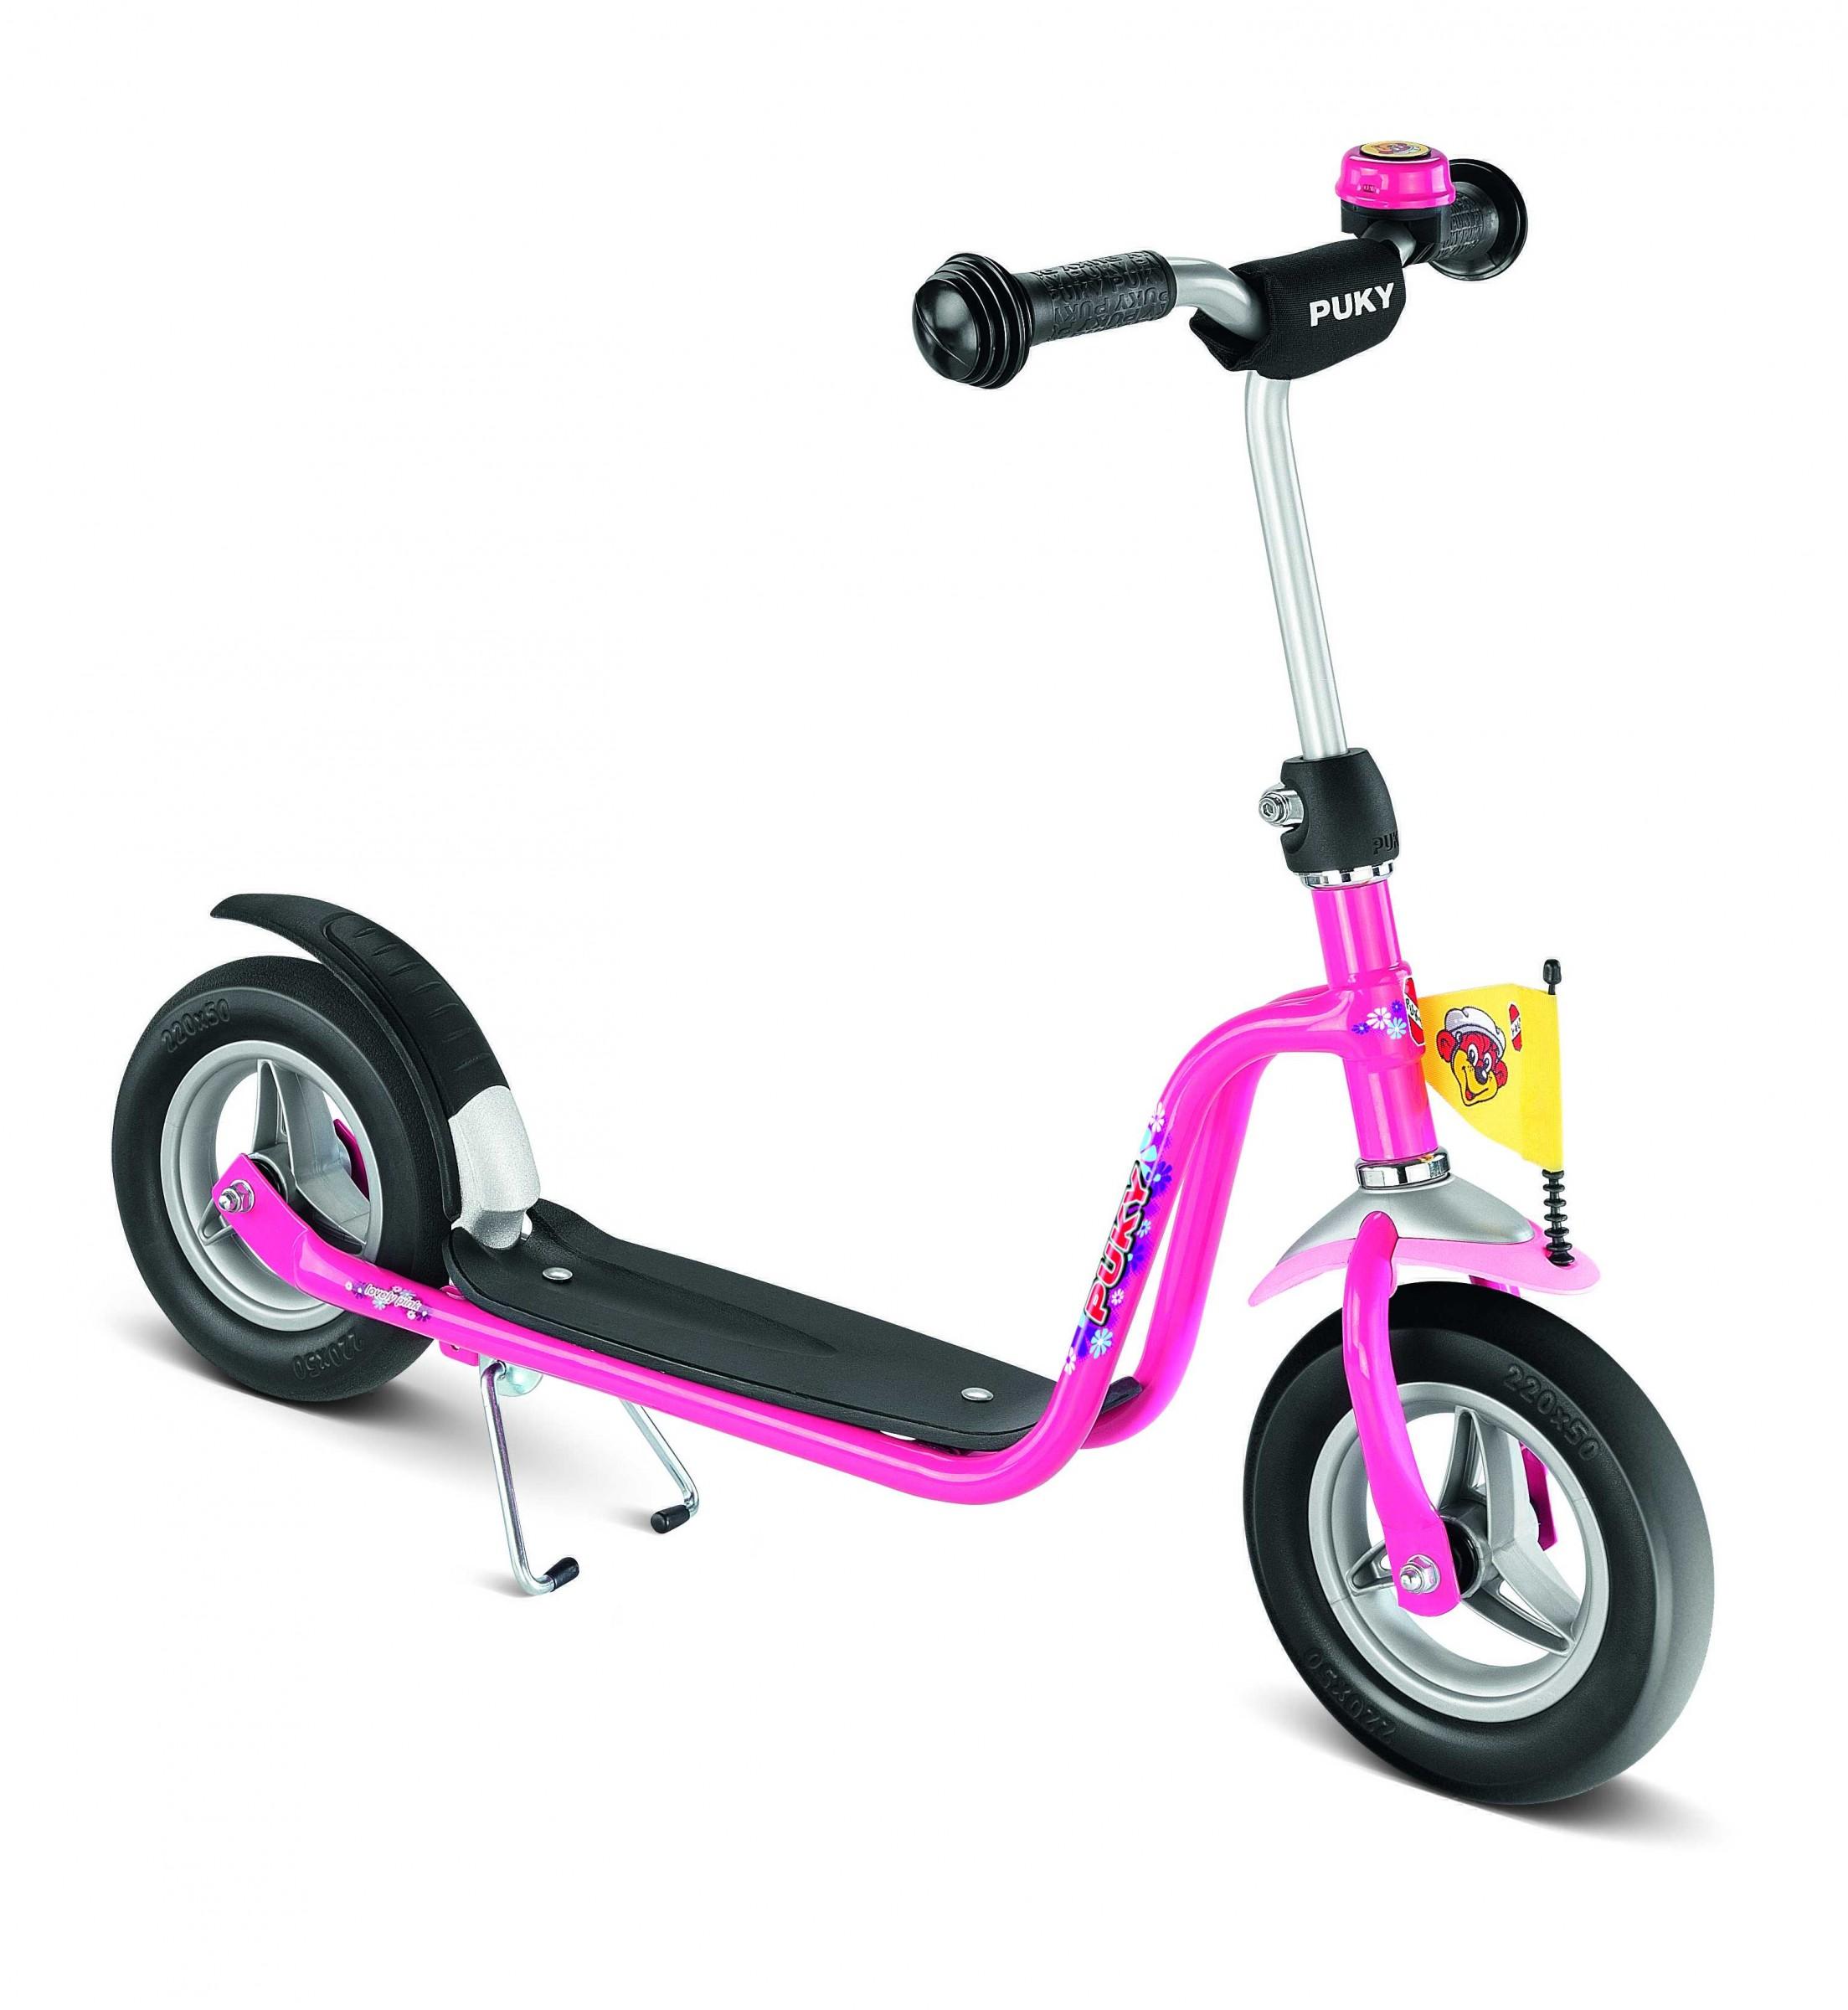 Puky Ballonroller R3 Lovely Pink